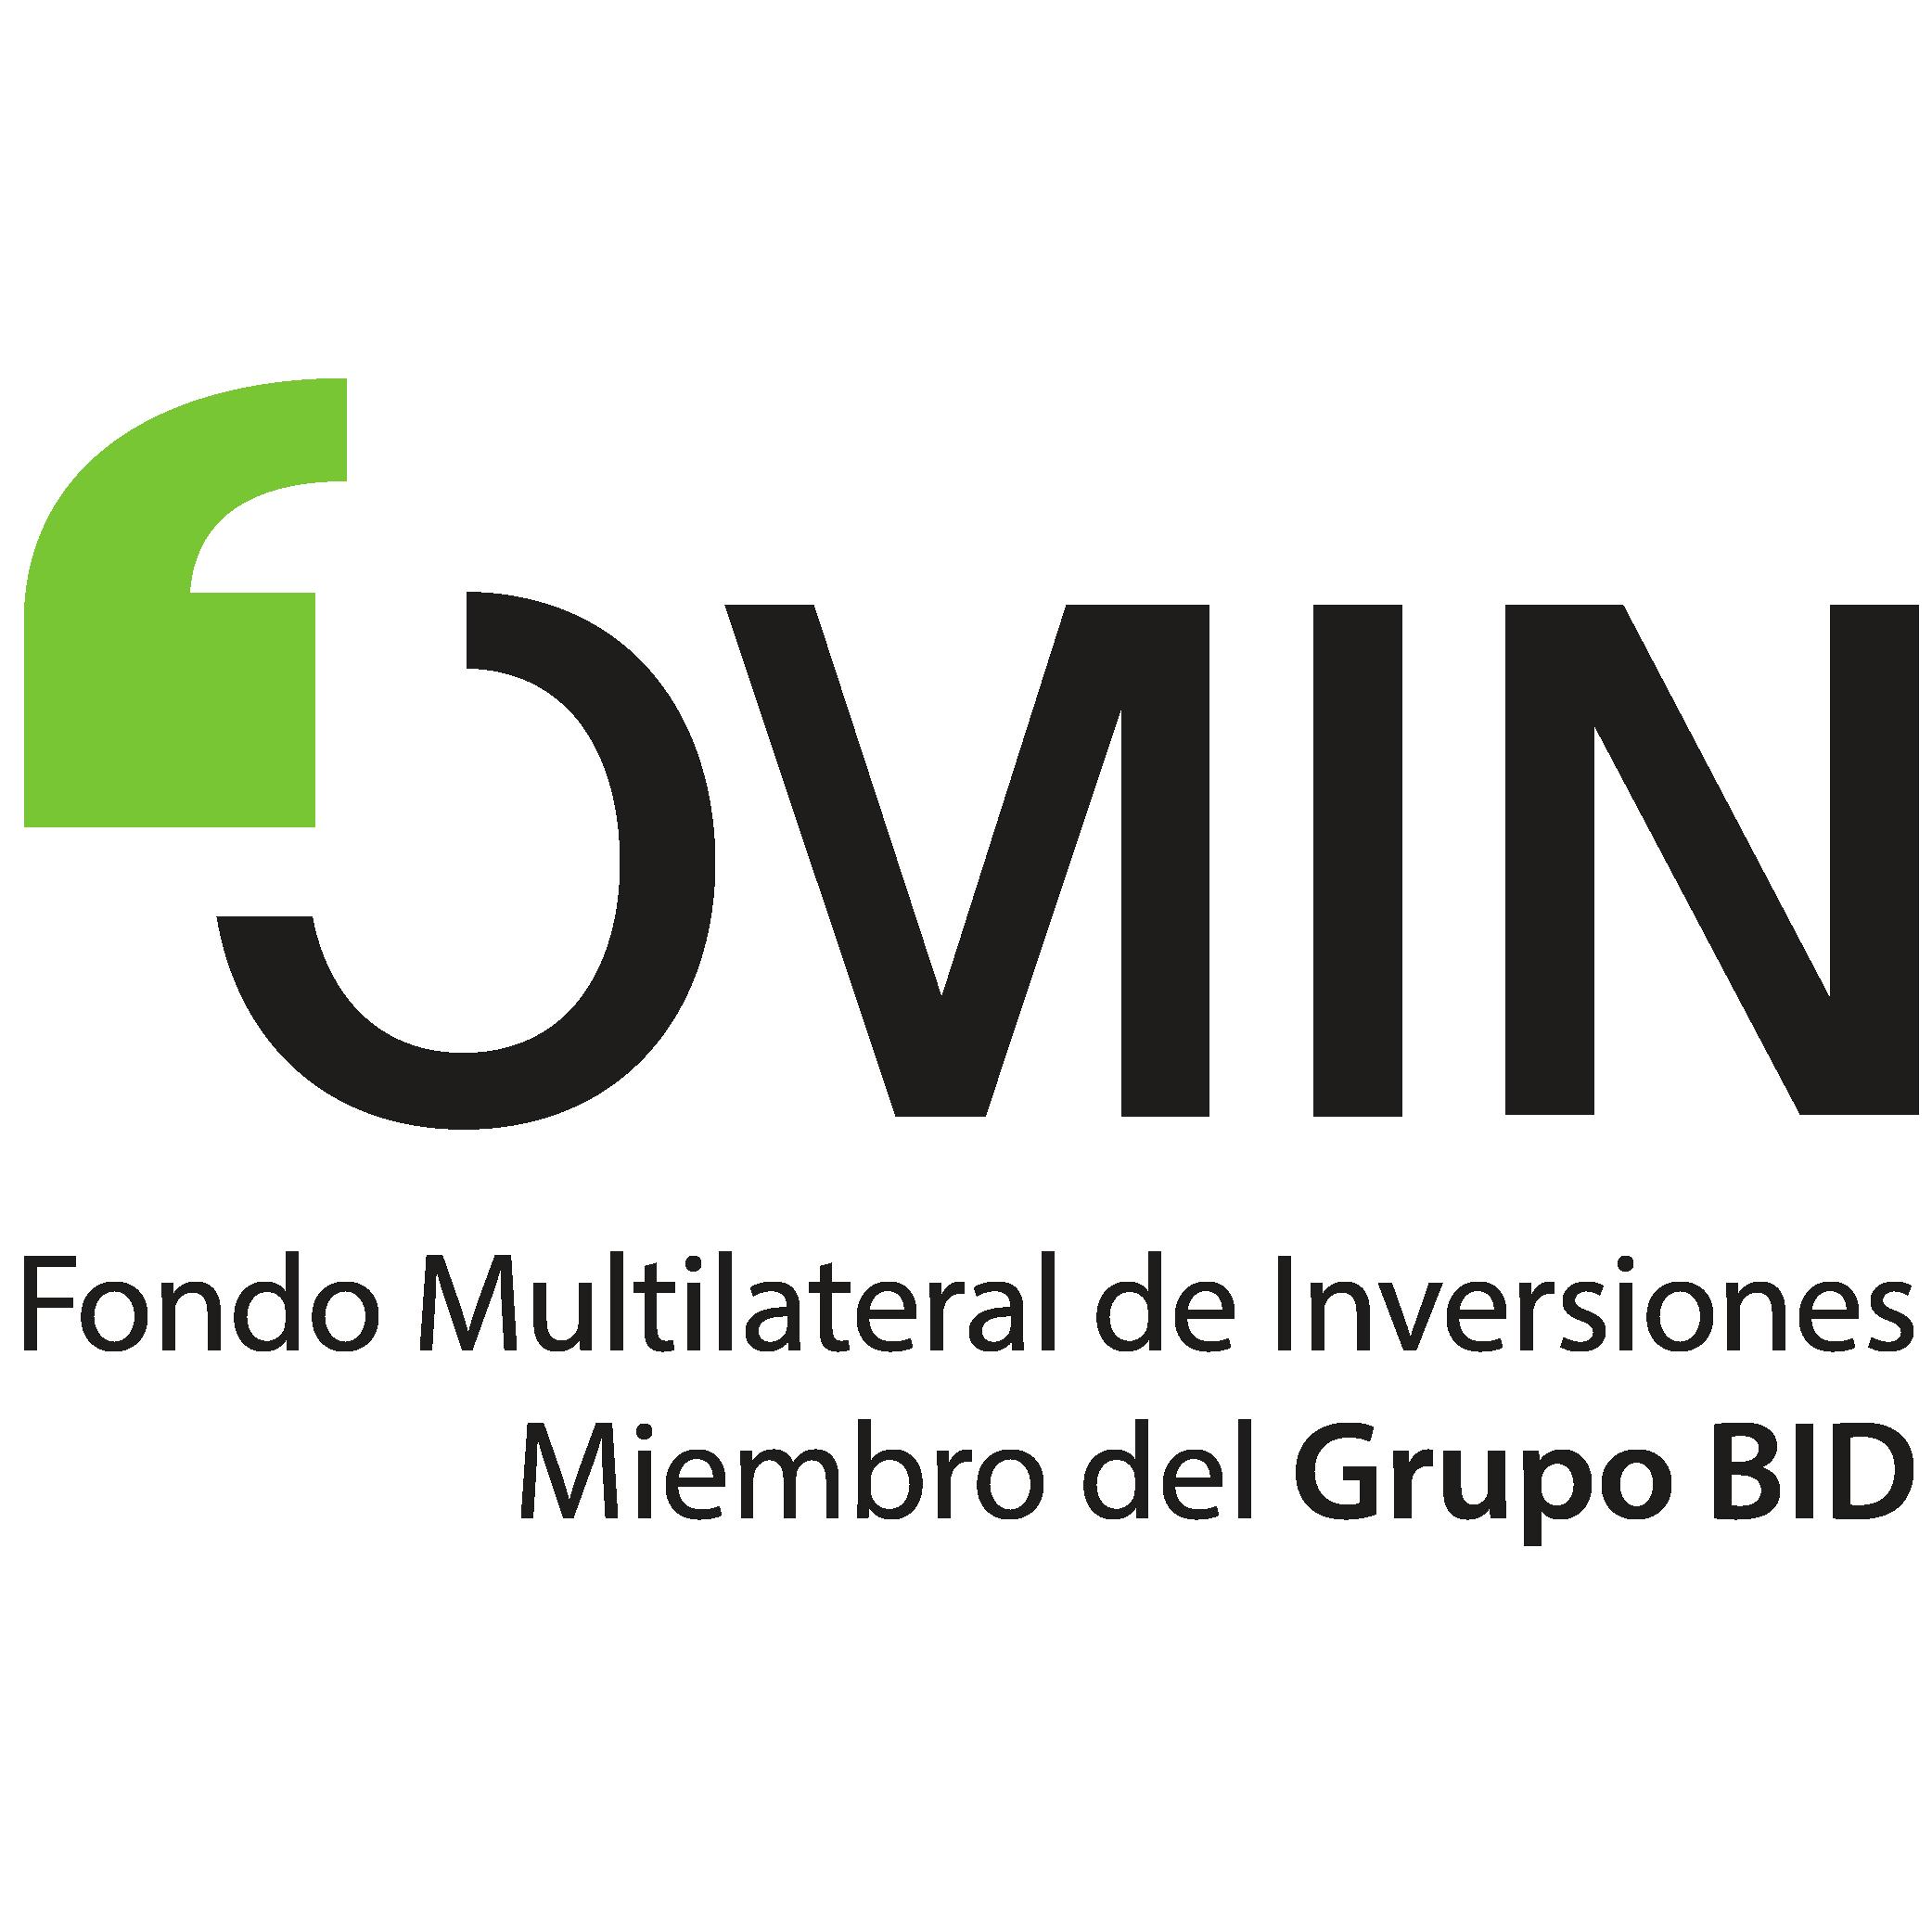 Fomin logo